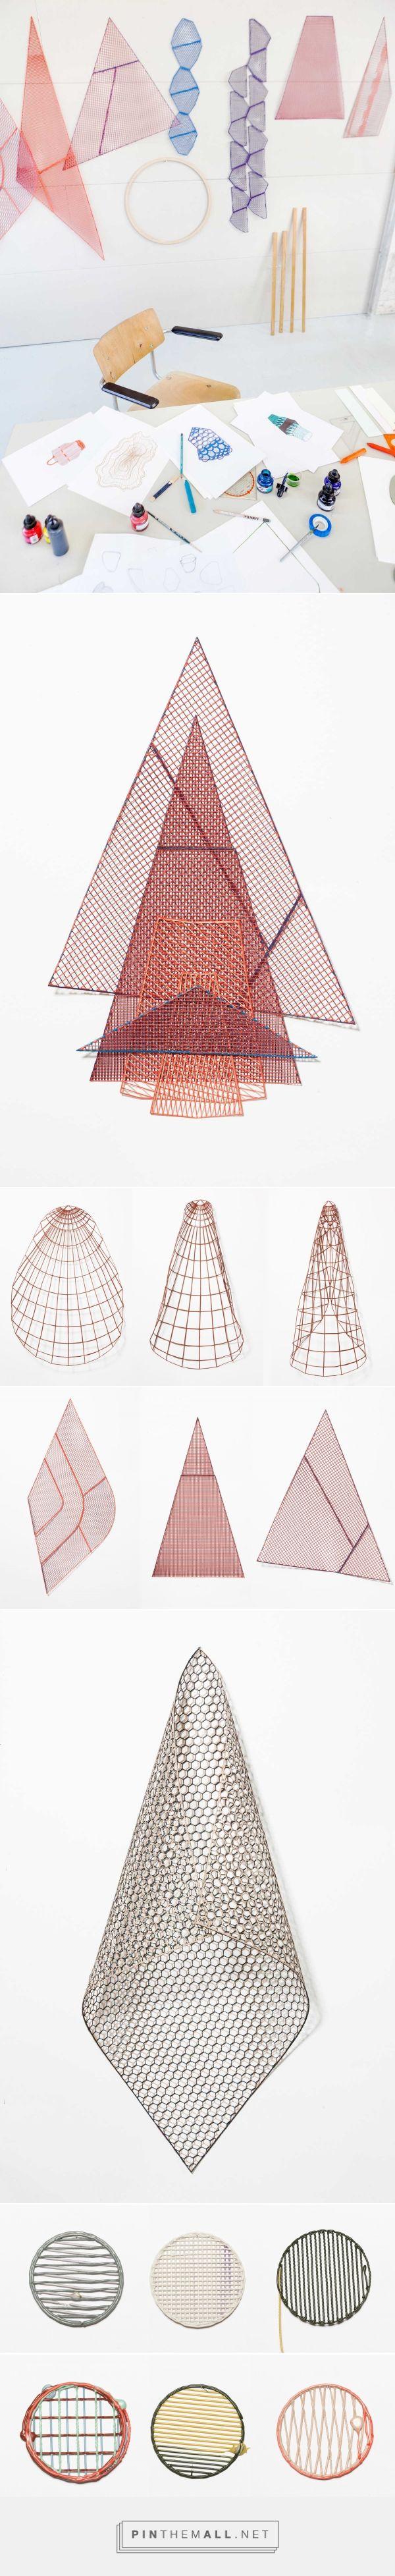 One Yarn Of Plastic: Digitally Printed Patterns by Studio Plott